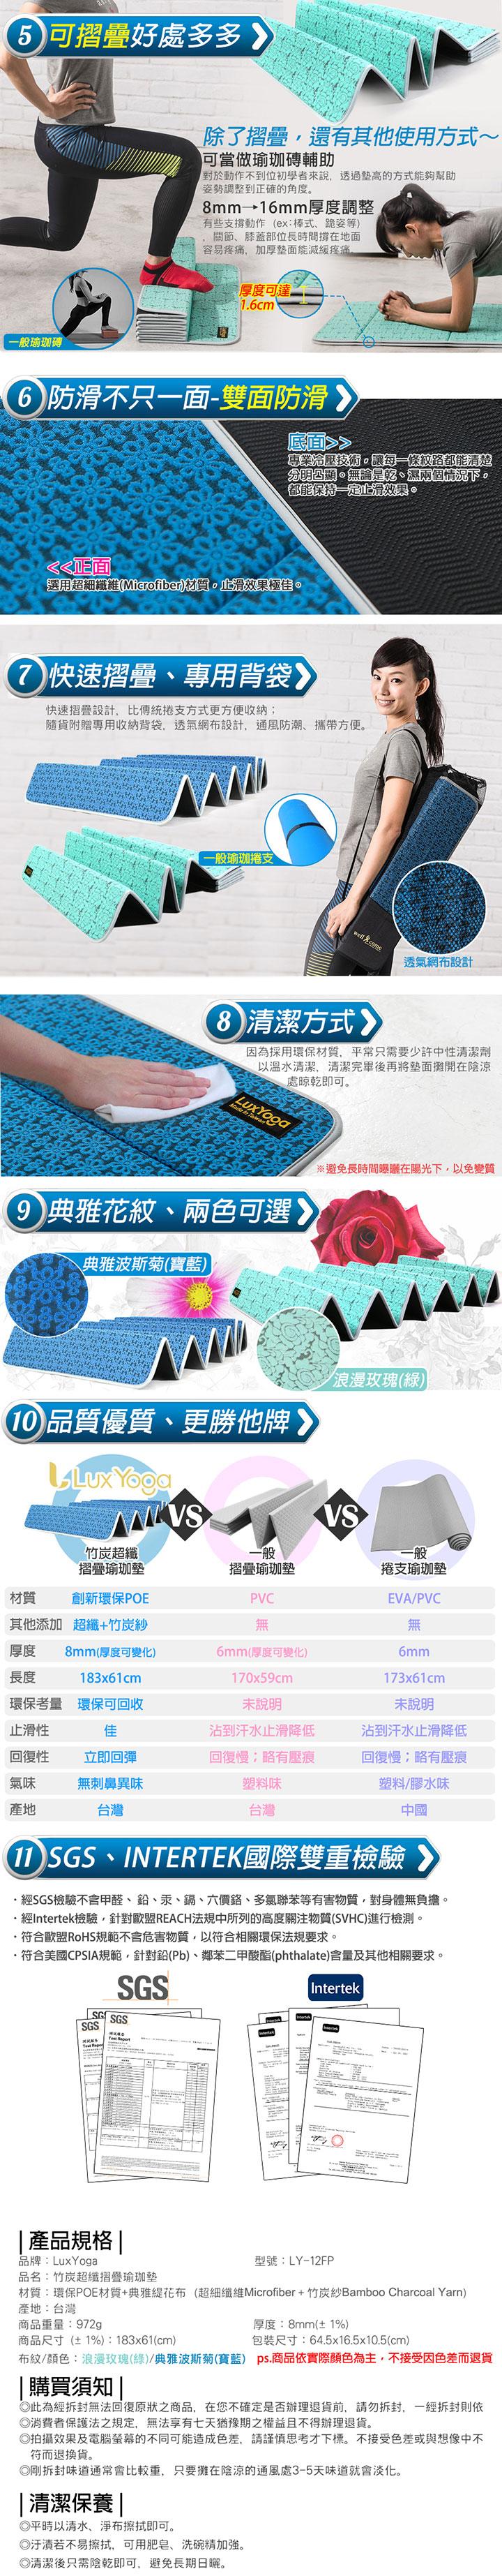 LuxYoga-摺疊瑜珈墊(竹炭超纖)-8mm